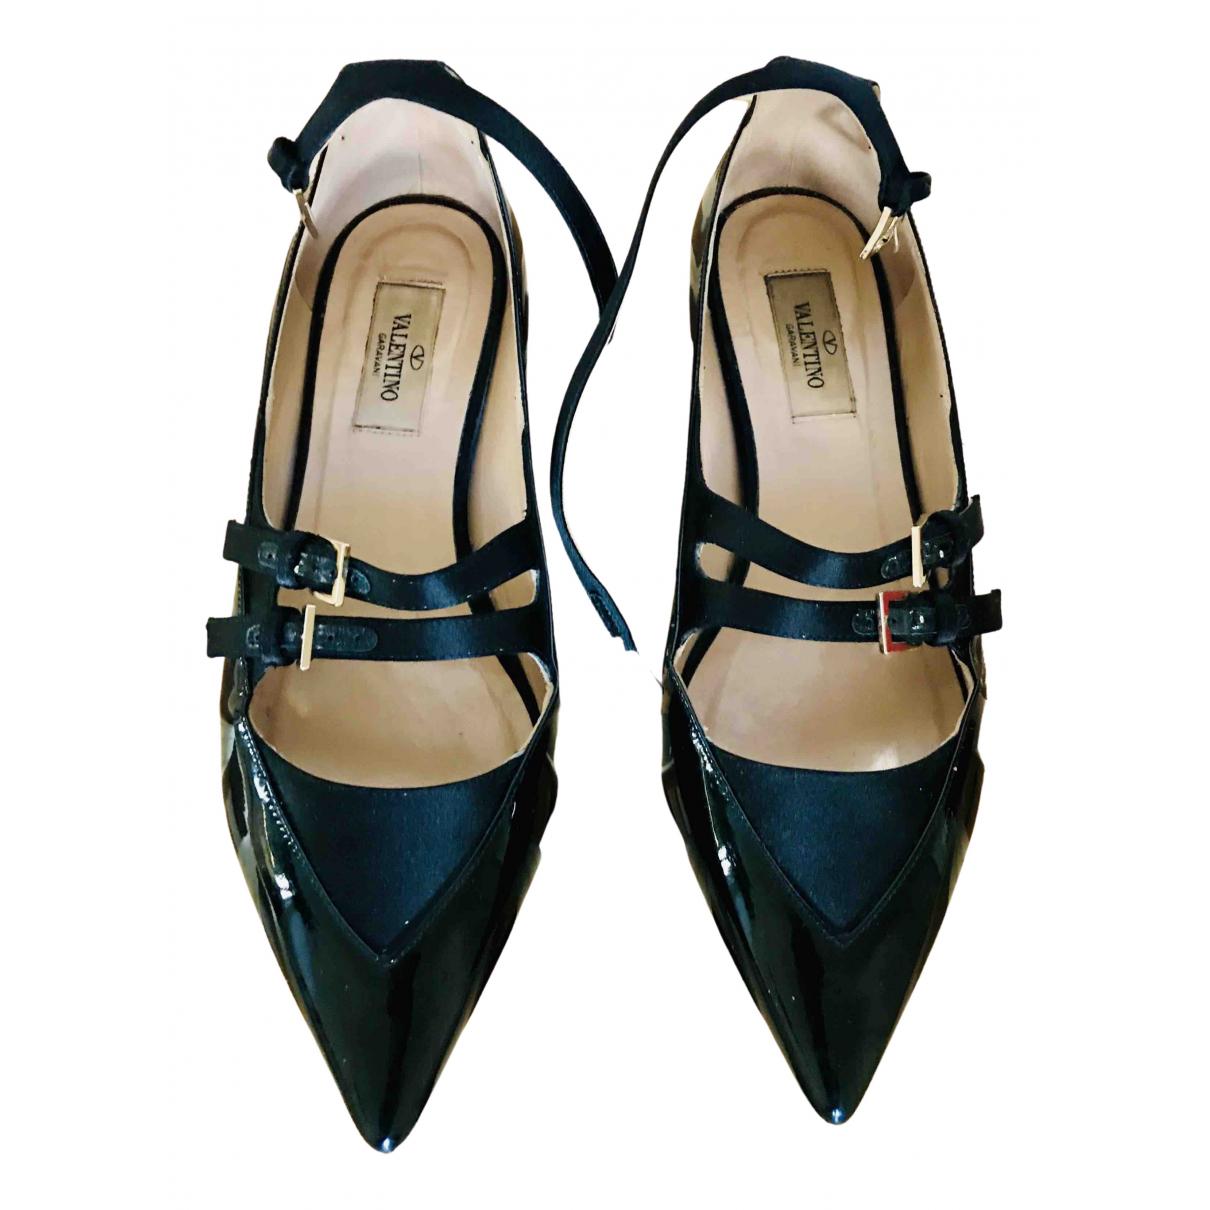 Valentino Garavani N Black Patent leather Ballet flats for Women 37.5 EU